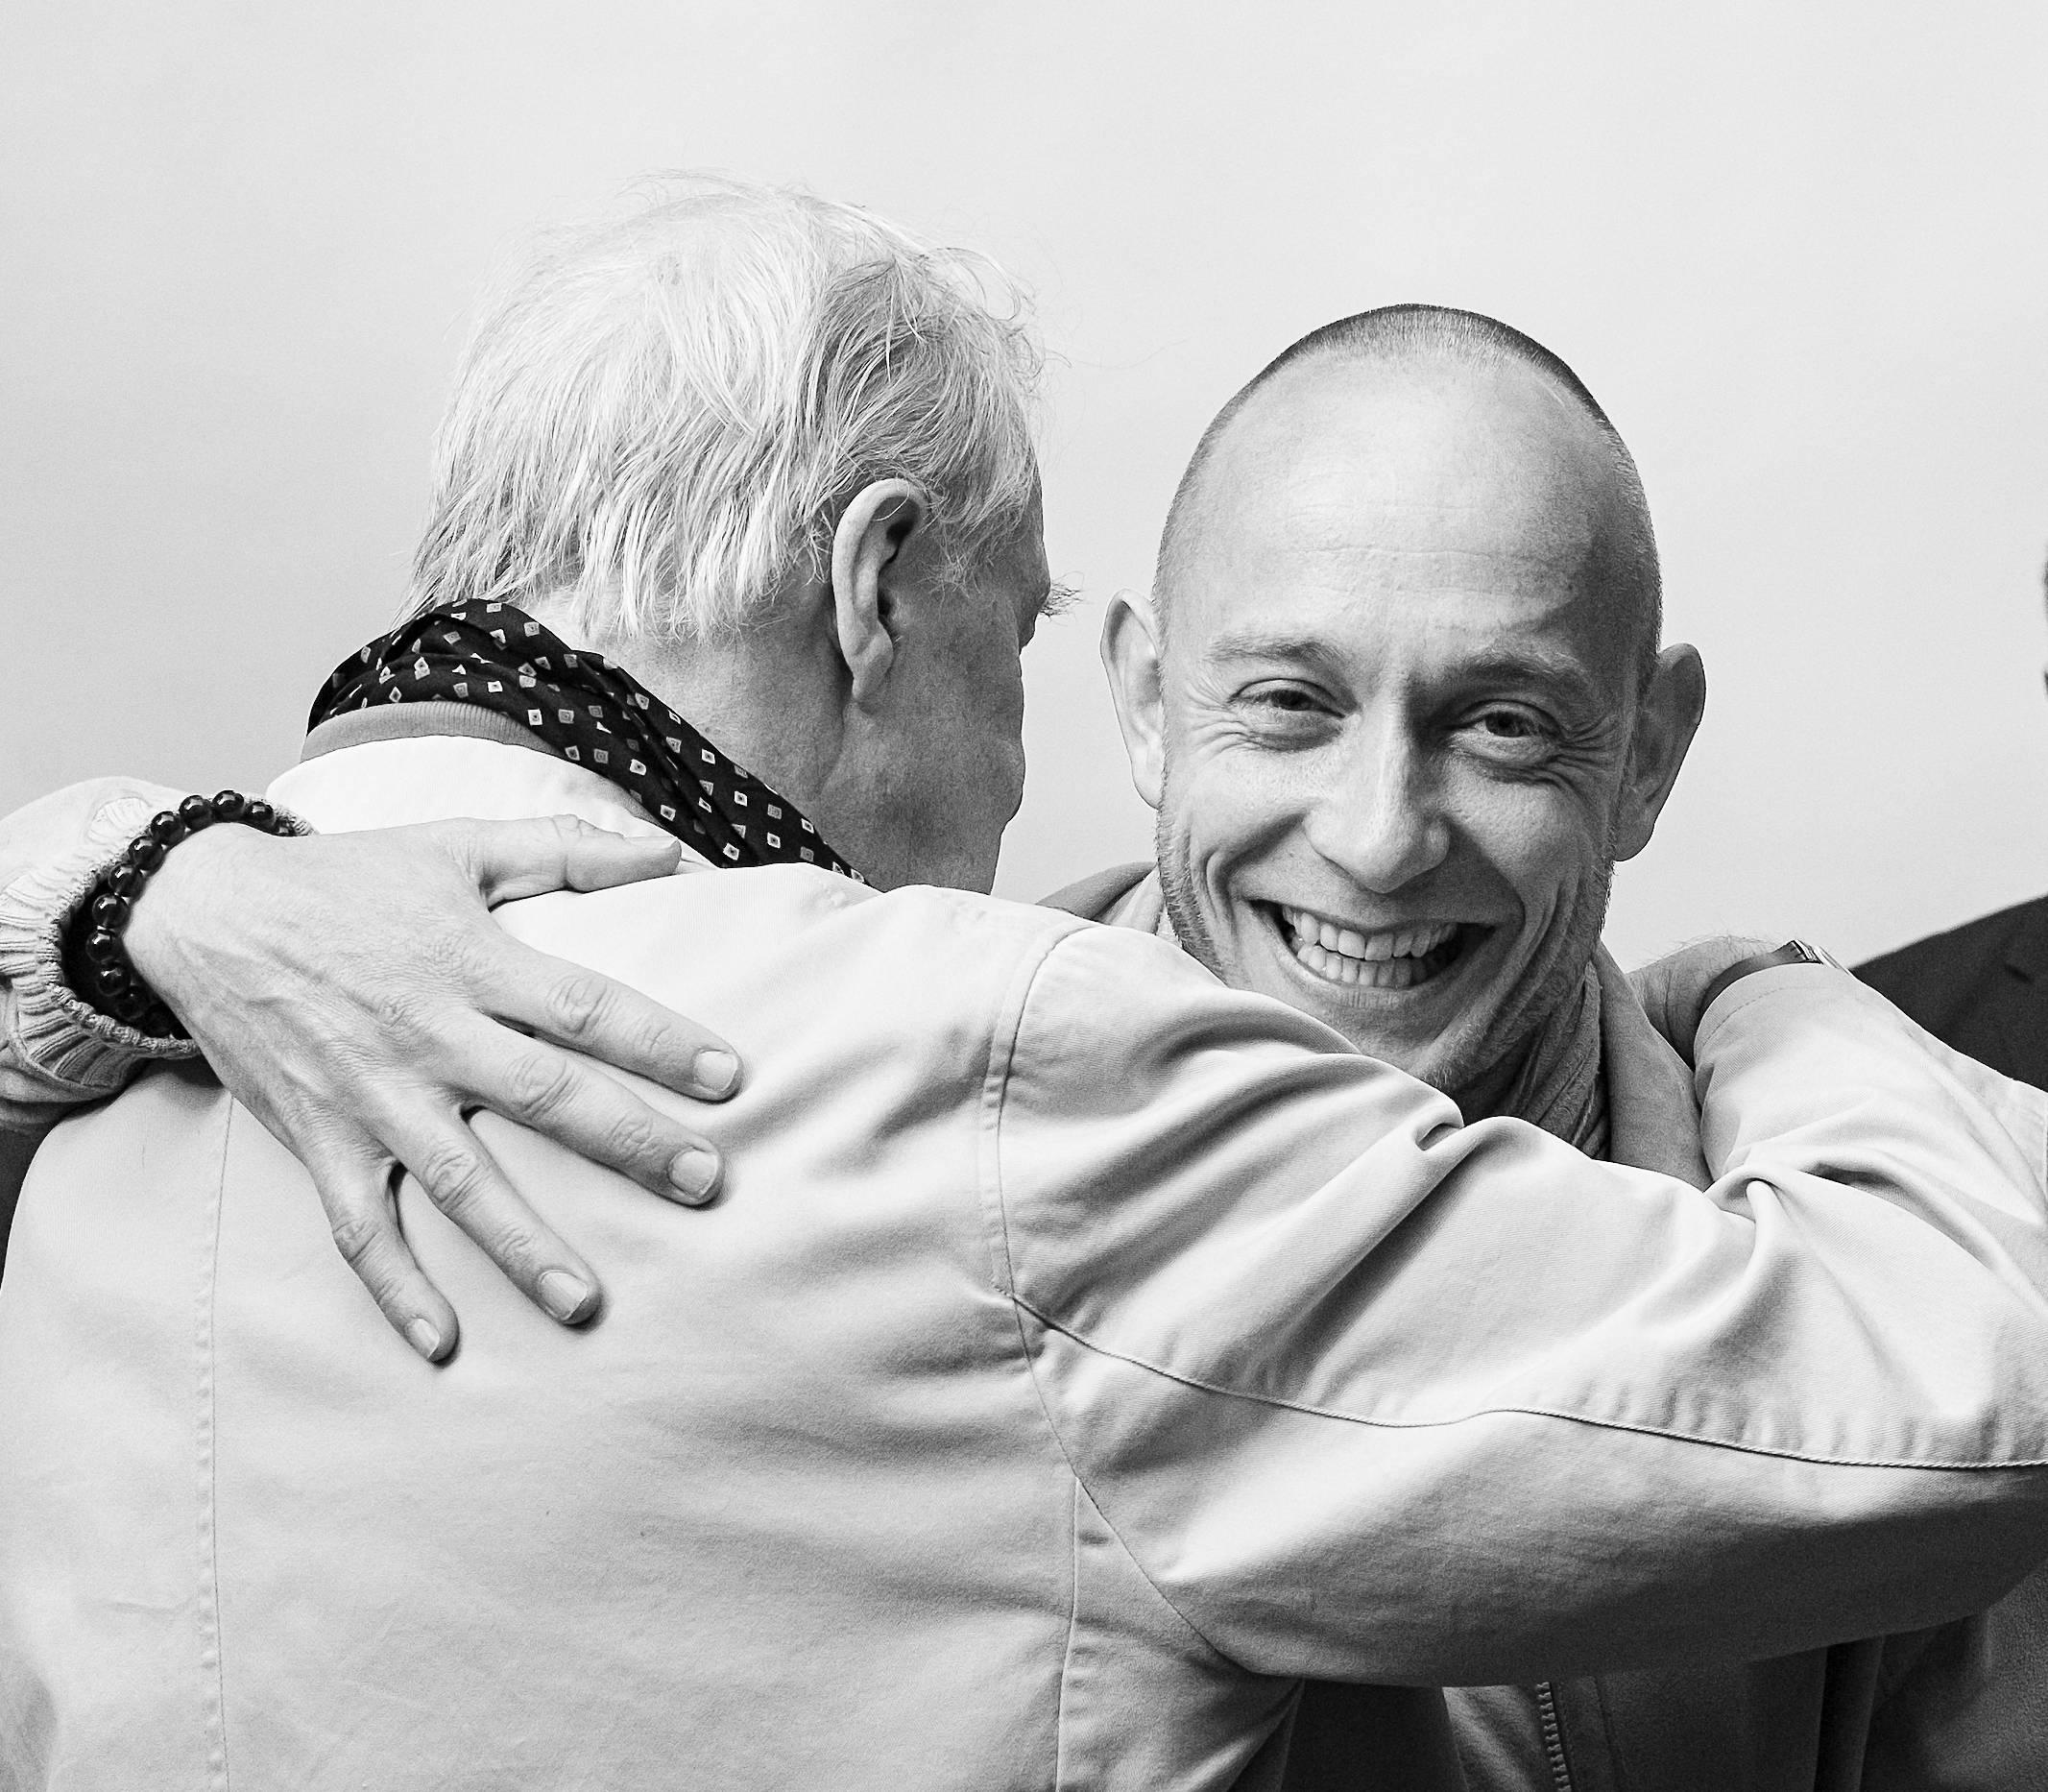 Jan van Duikeren Quartet featuring John Engels